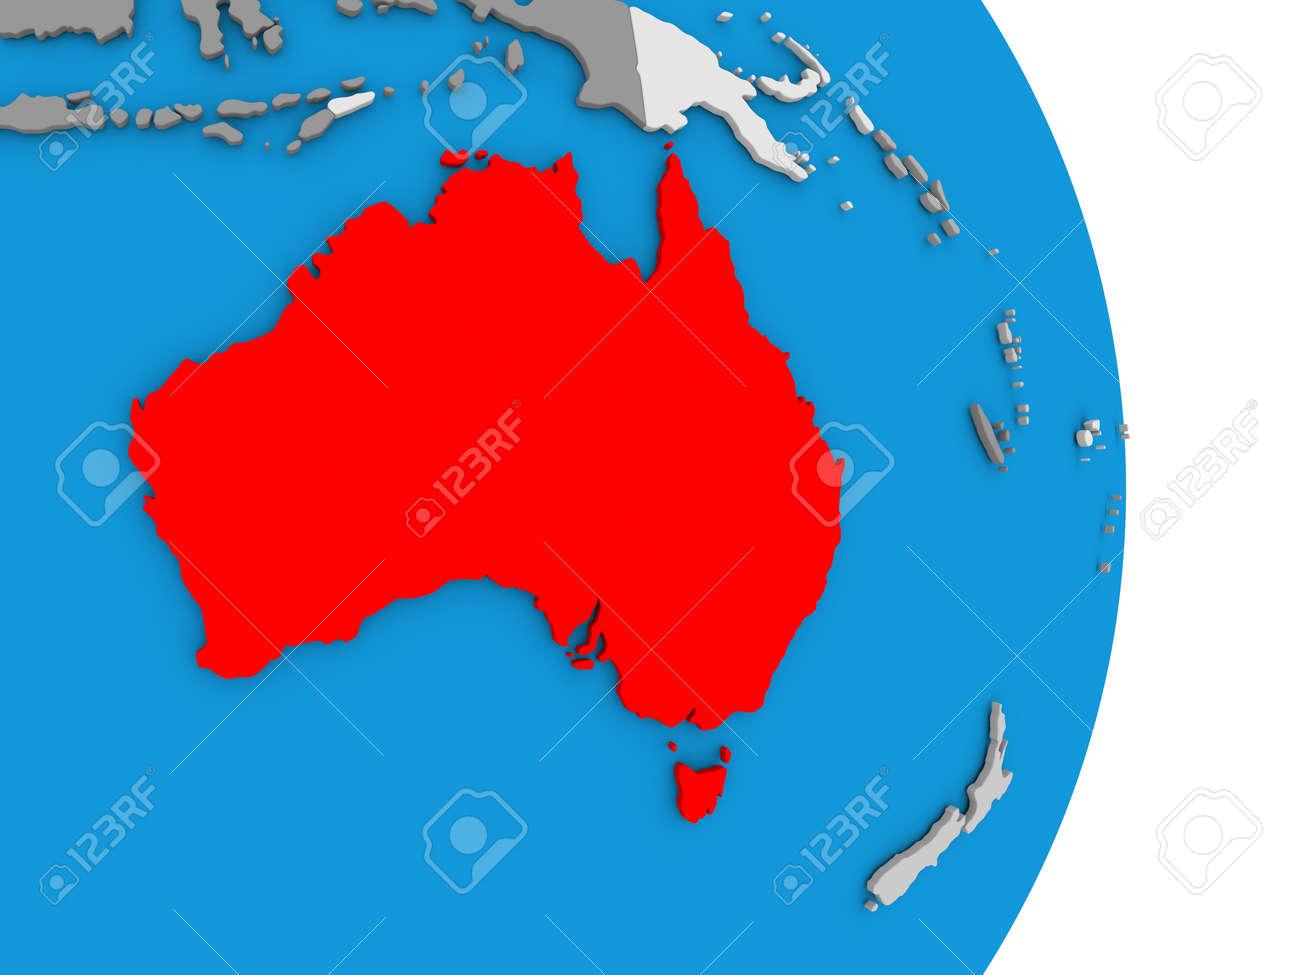 illustration map of australia in red on globe 3d illustration